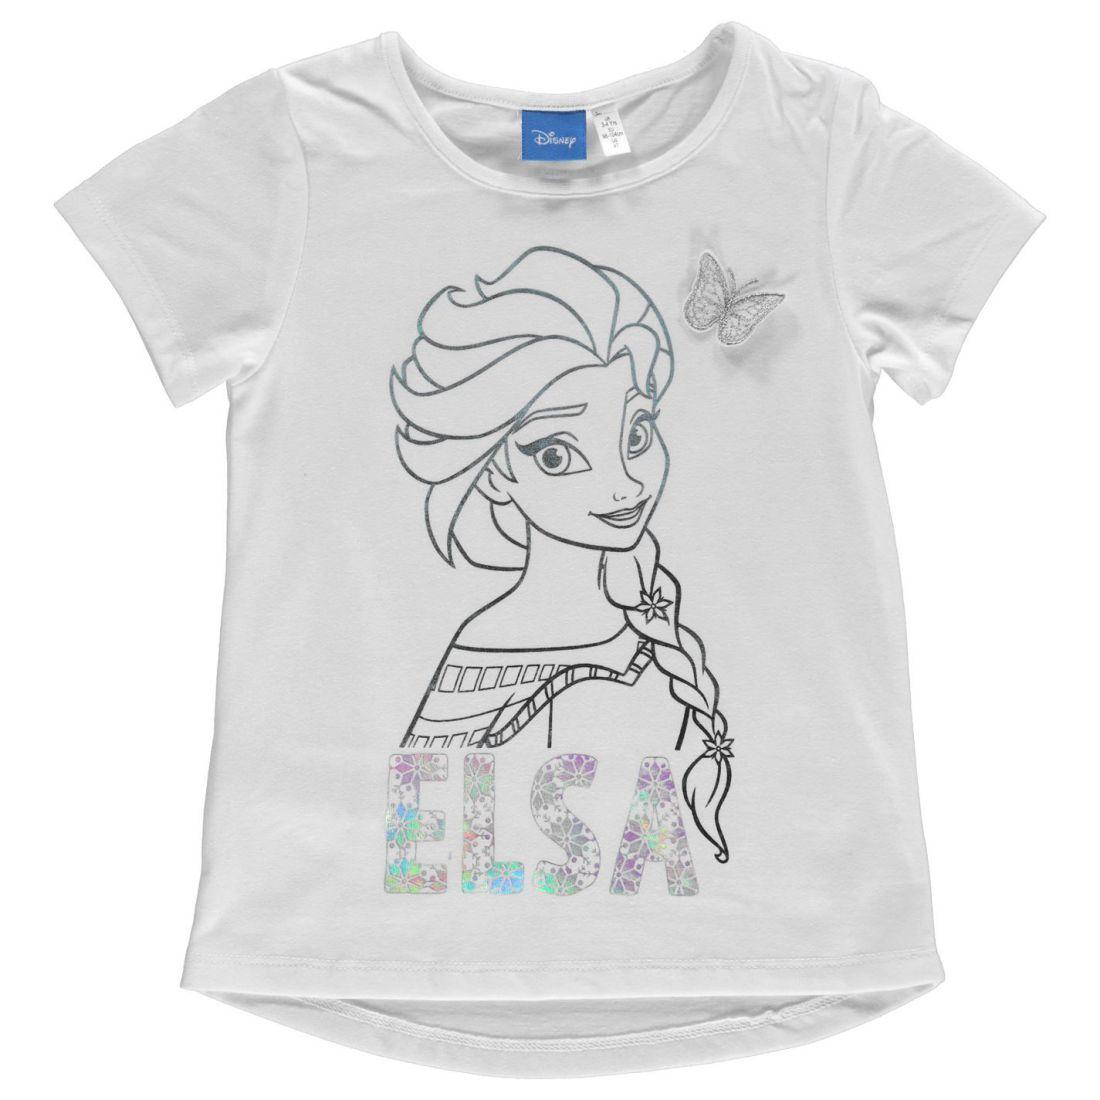 7b62180c00dc Character Short Sleeve T Shirt Infants Girls Crew Neck Tee Top Round ...